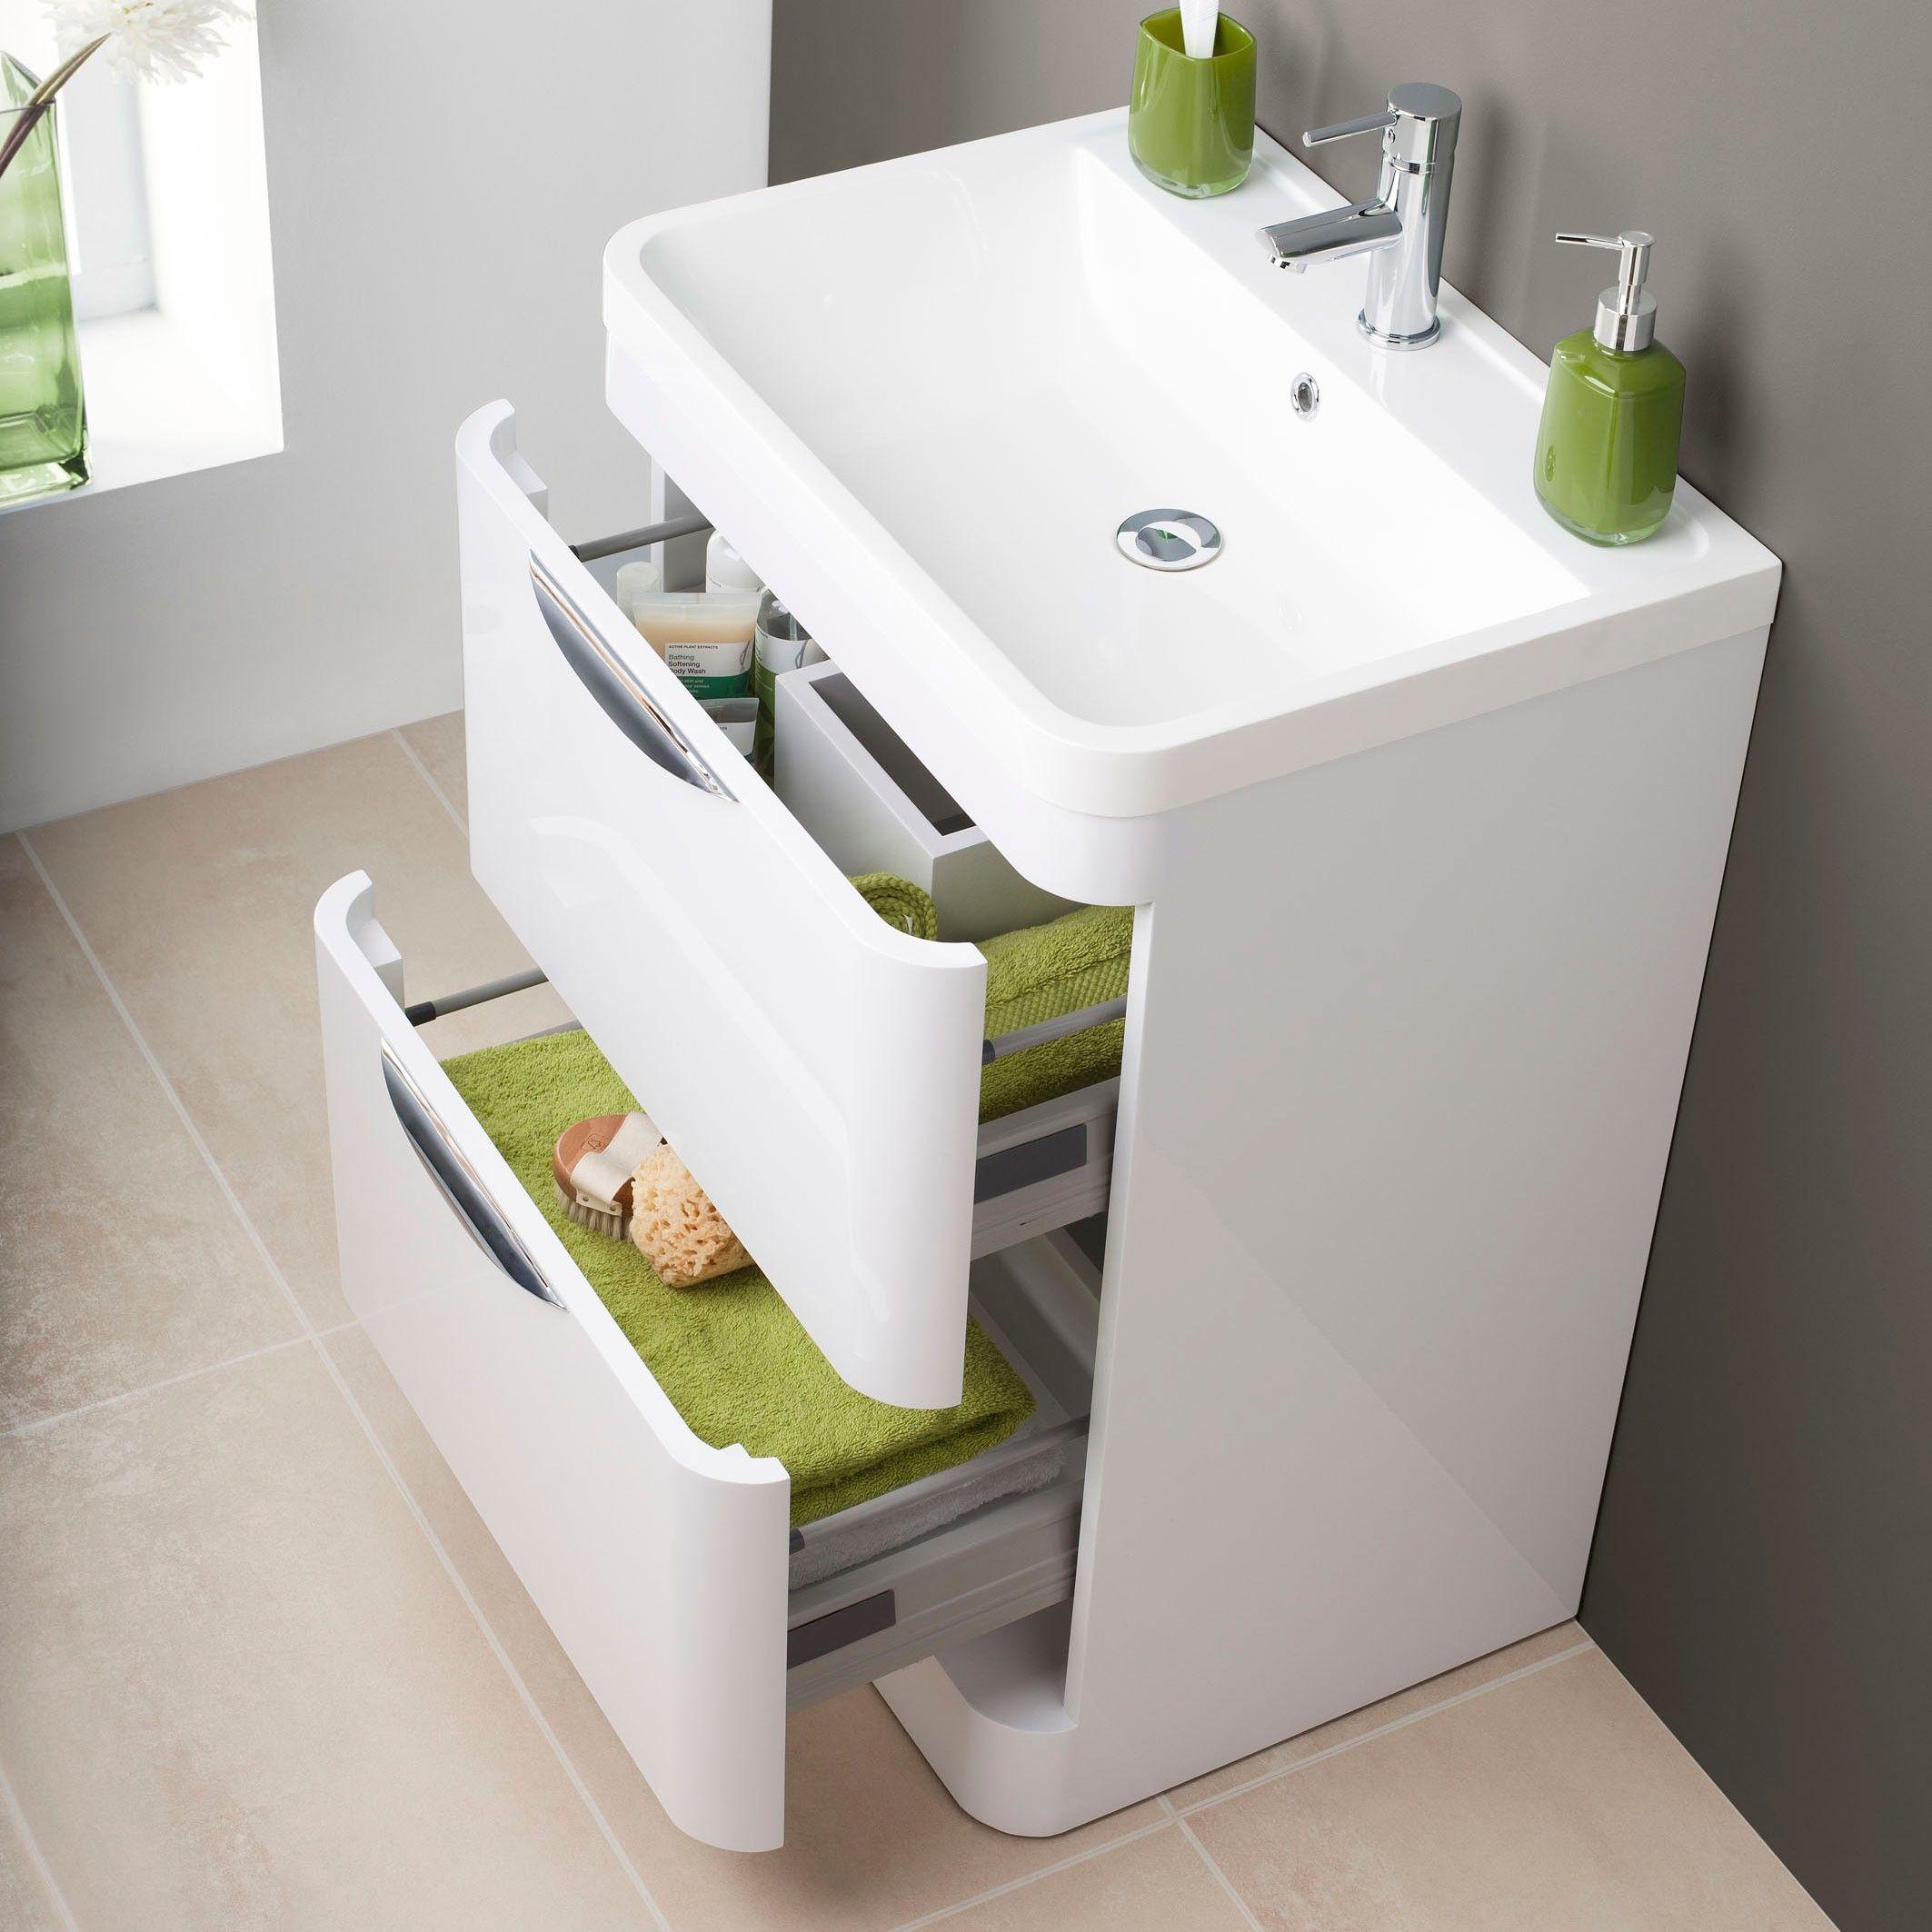 Premier Parade Floor Standing Bathroom Vanity Unit With Basin Wide   1 Tap